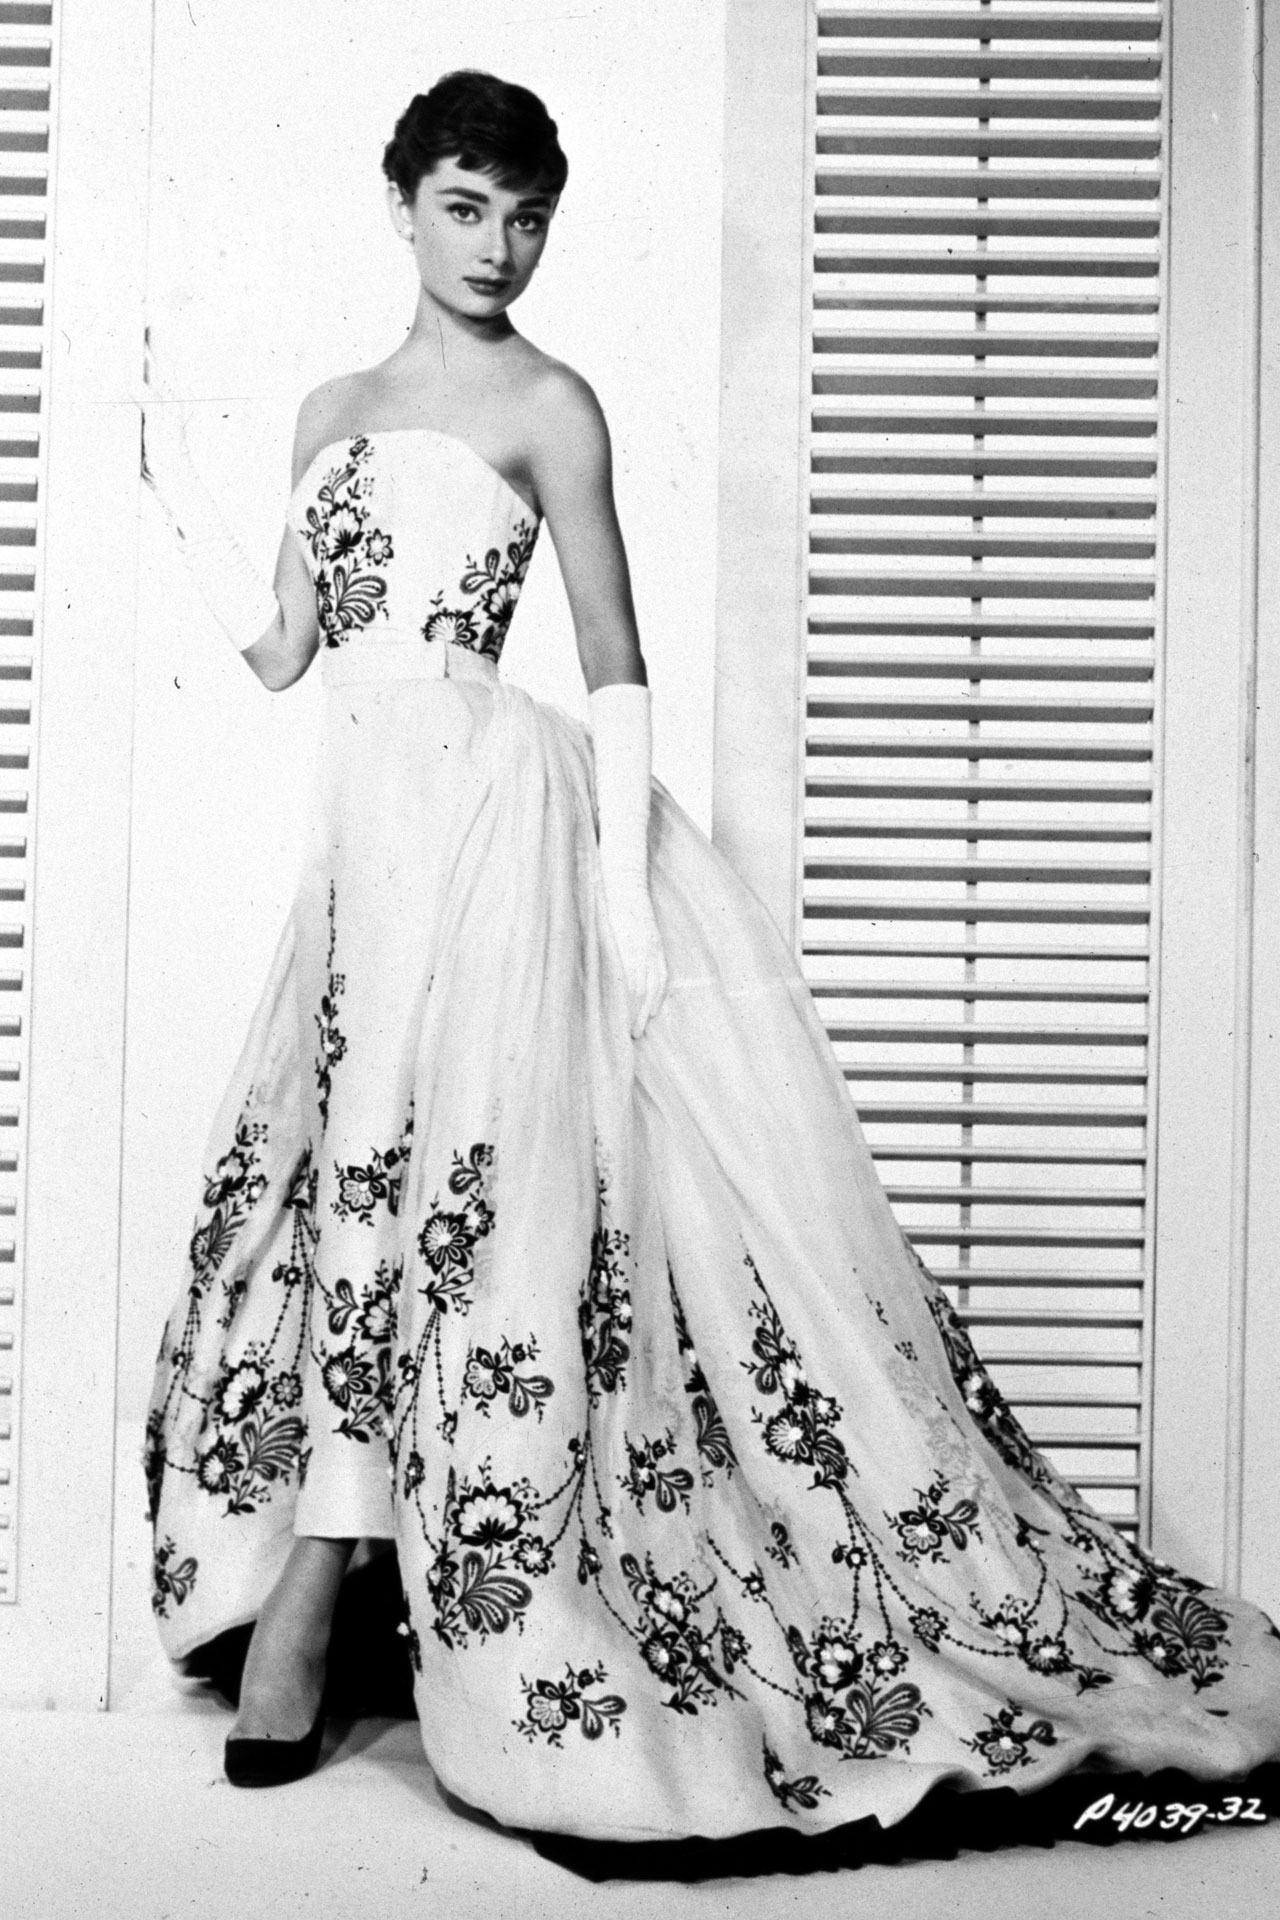 audreyhepburn_sabrina_givenchy-ballgown_1954_pr.jpg